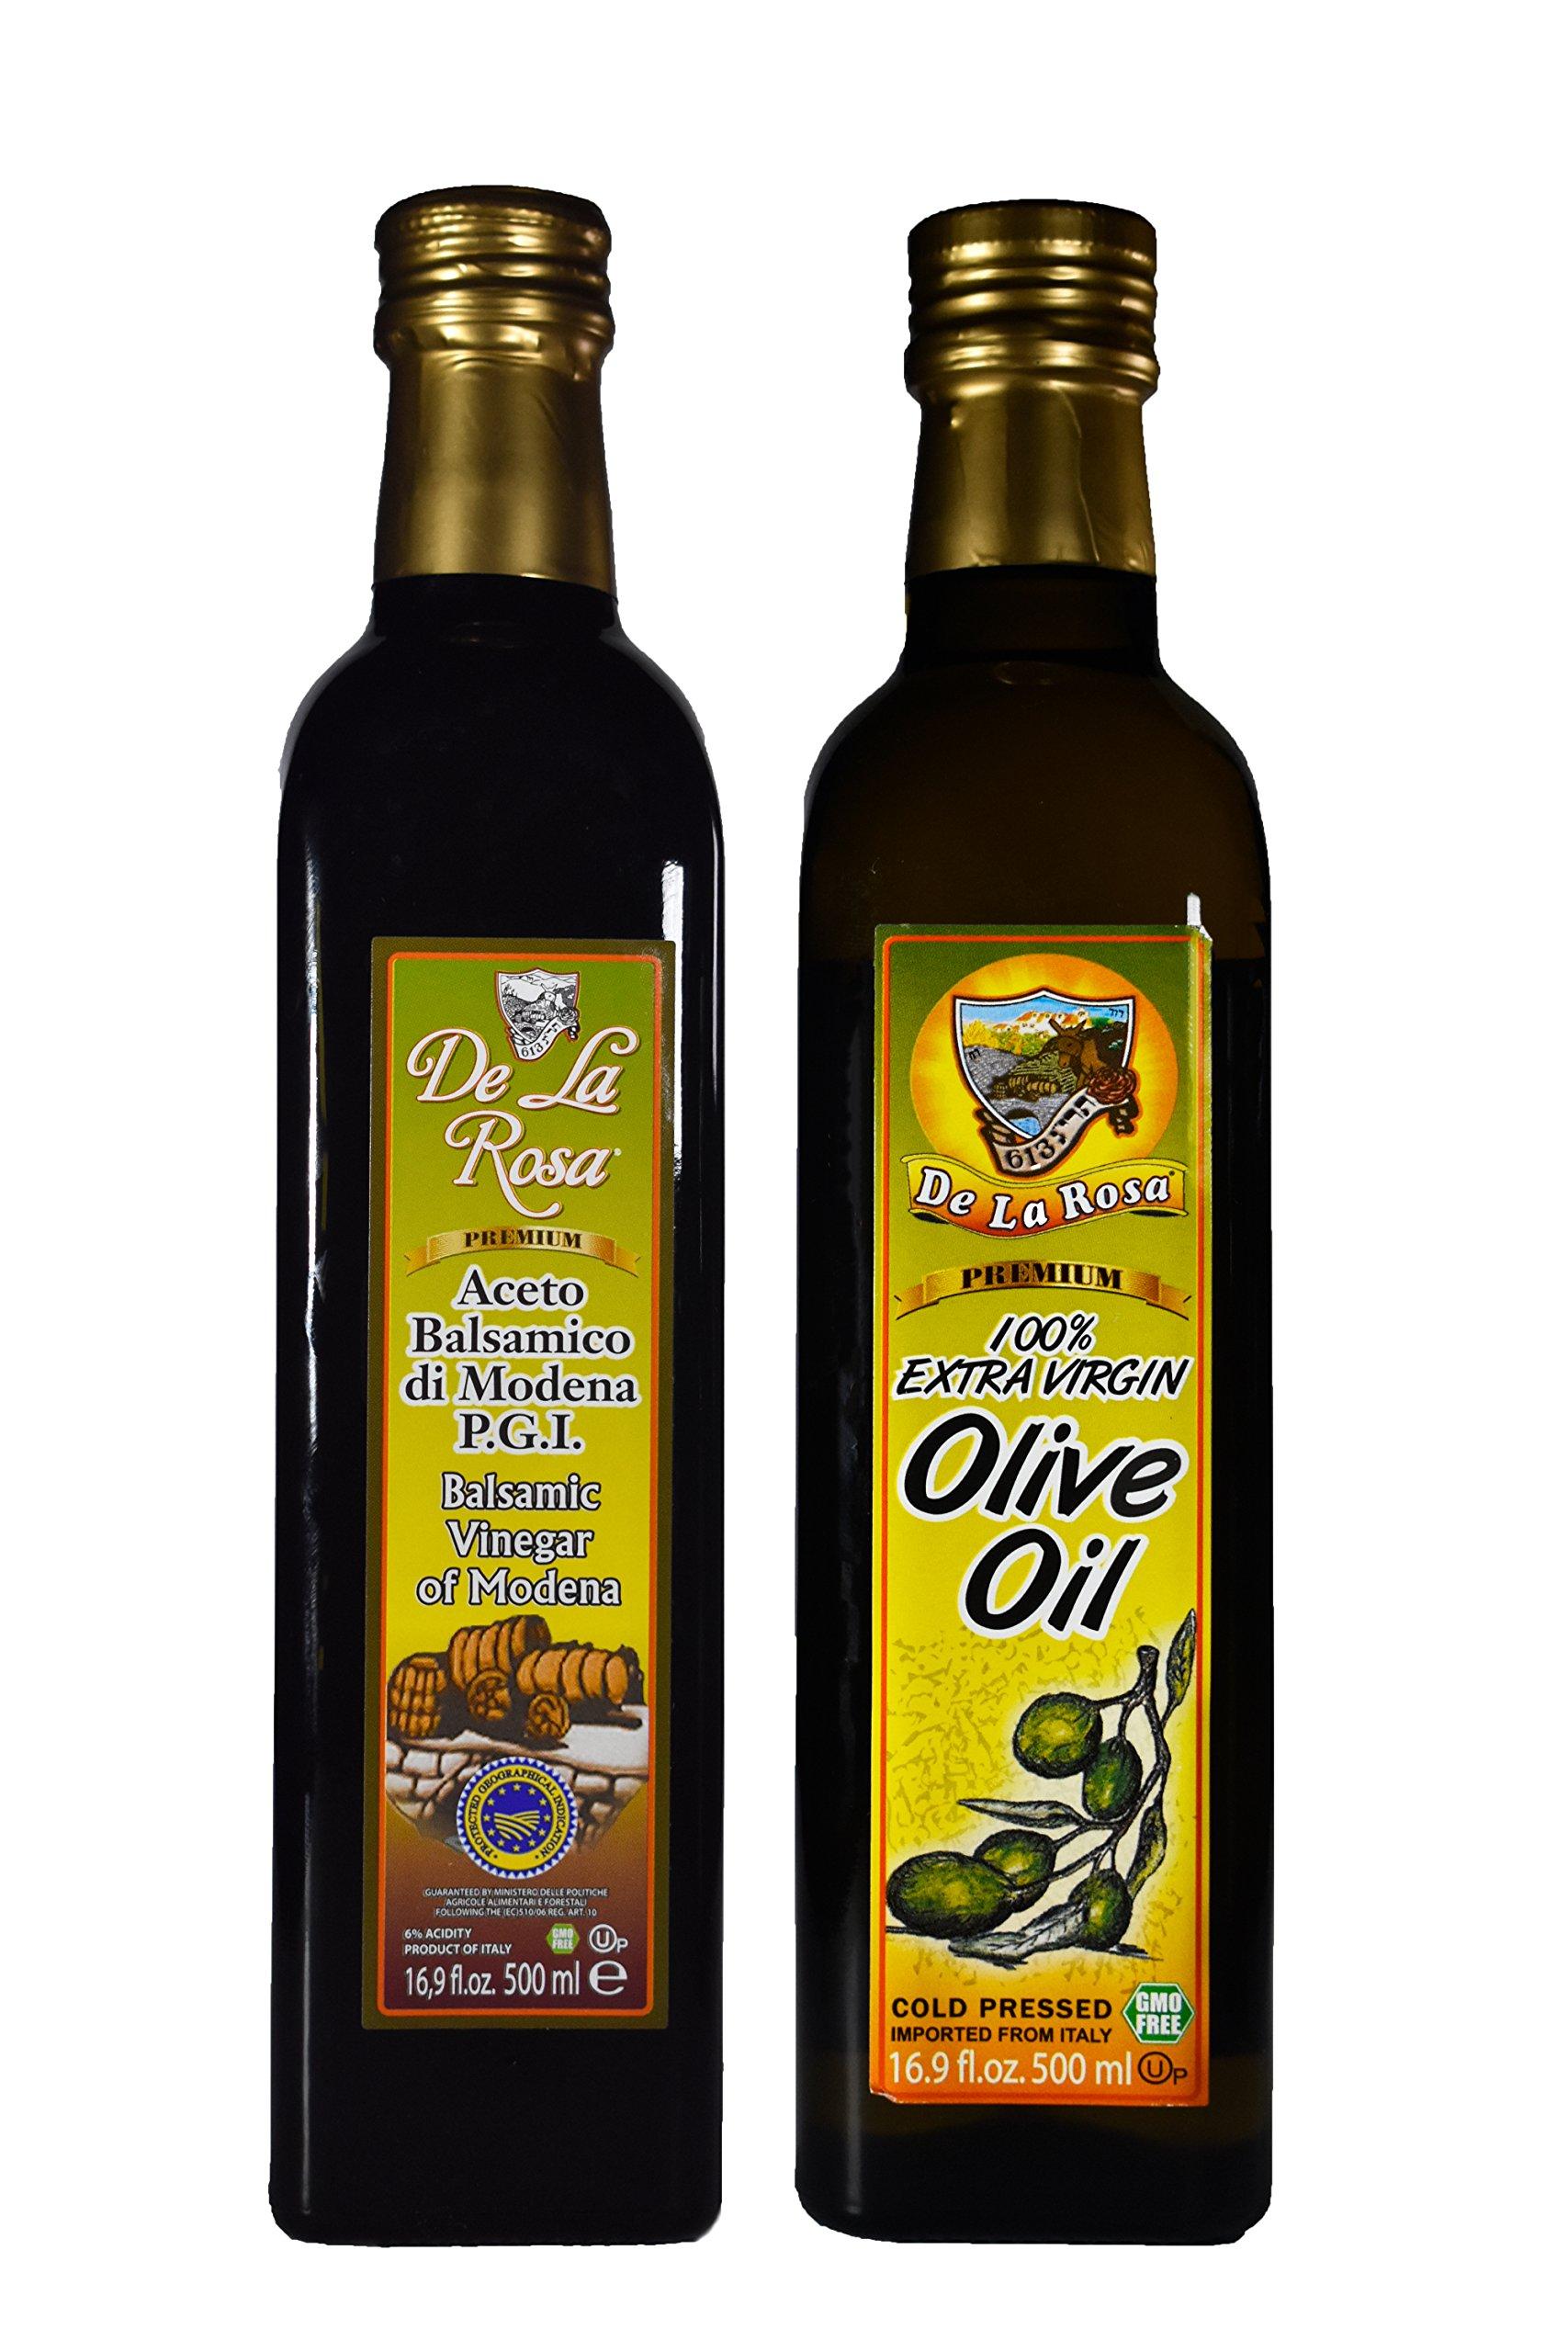 De La Rosa Real Foods & Vineyards - Kosher Italian Aged Balsamic Vinegar of Modena & Kosher EVOO 16.9 oz each